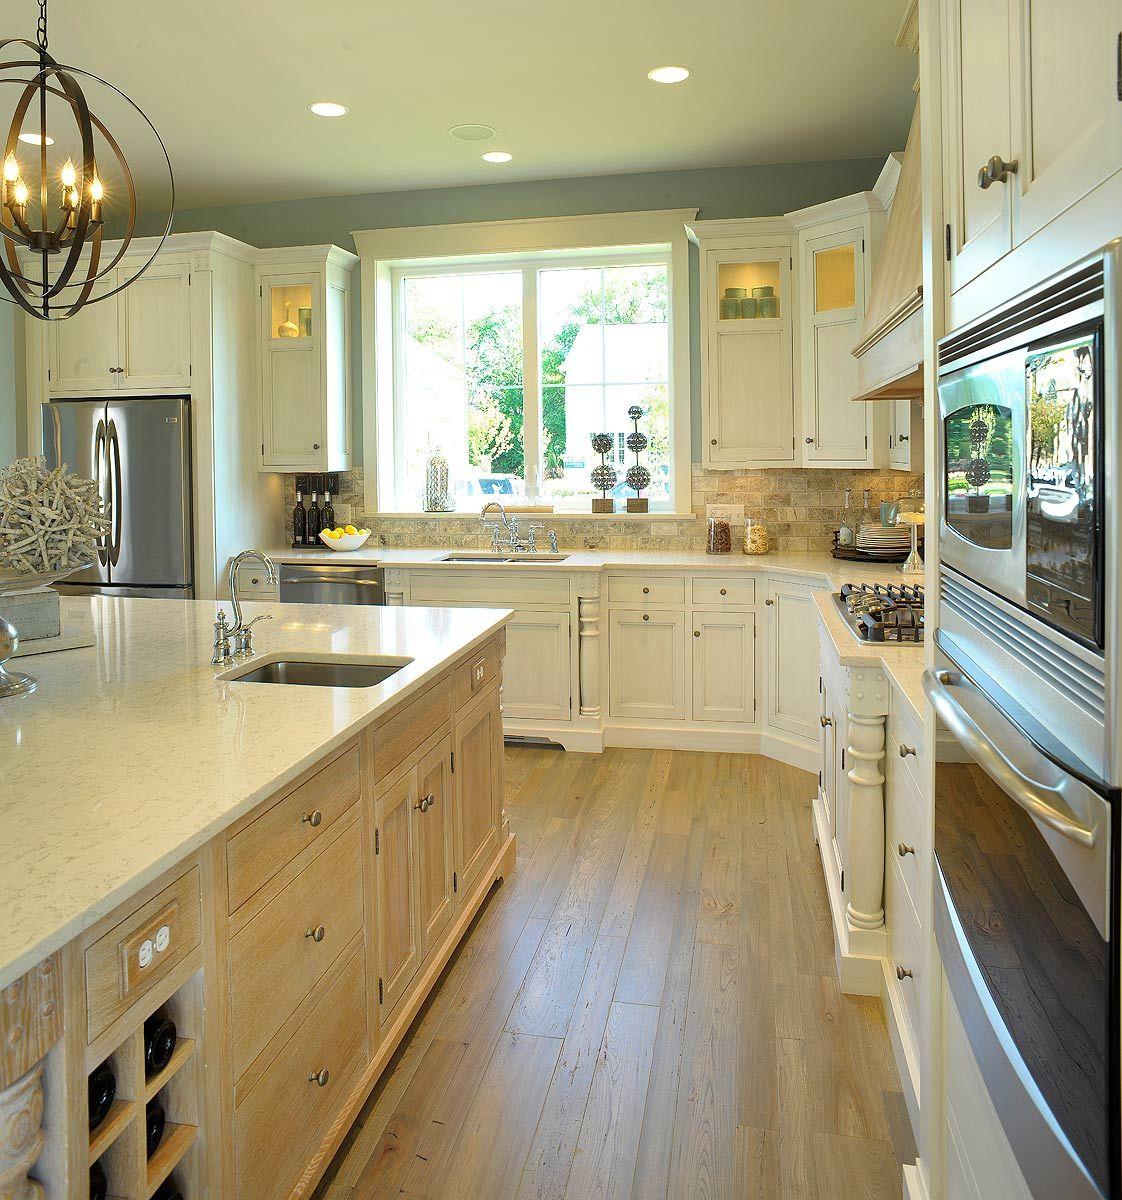 Elegant Whitewashed Kitchen With Quarter